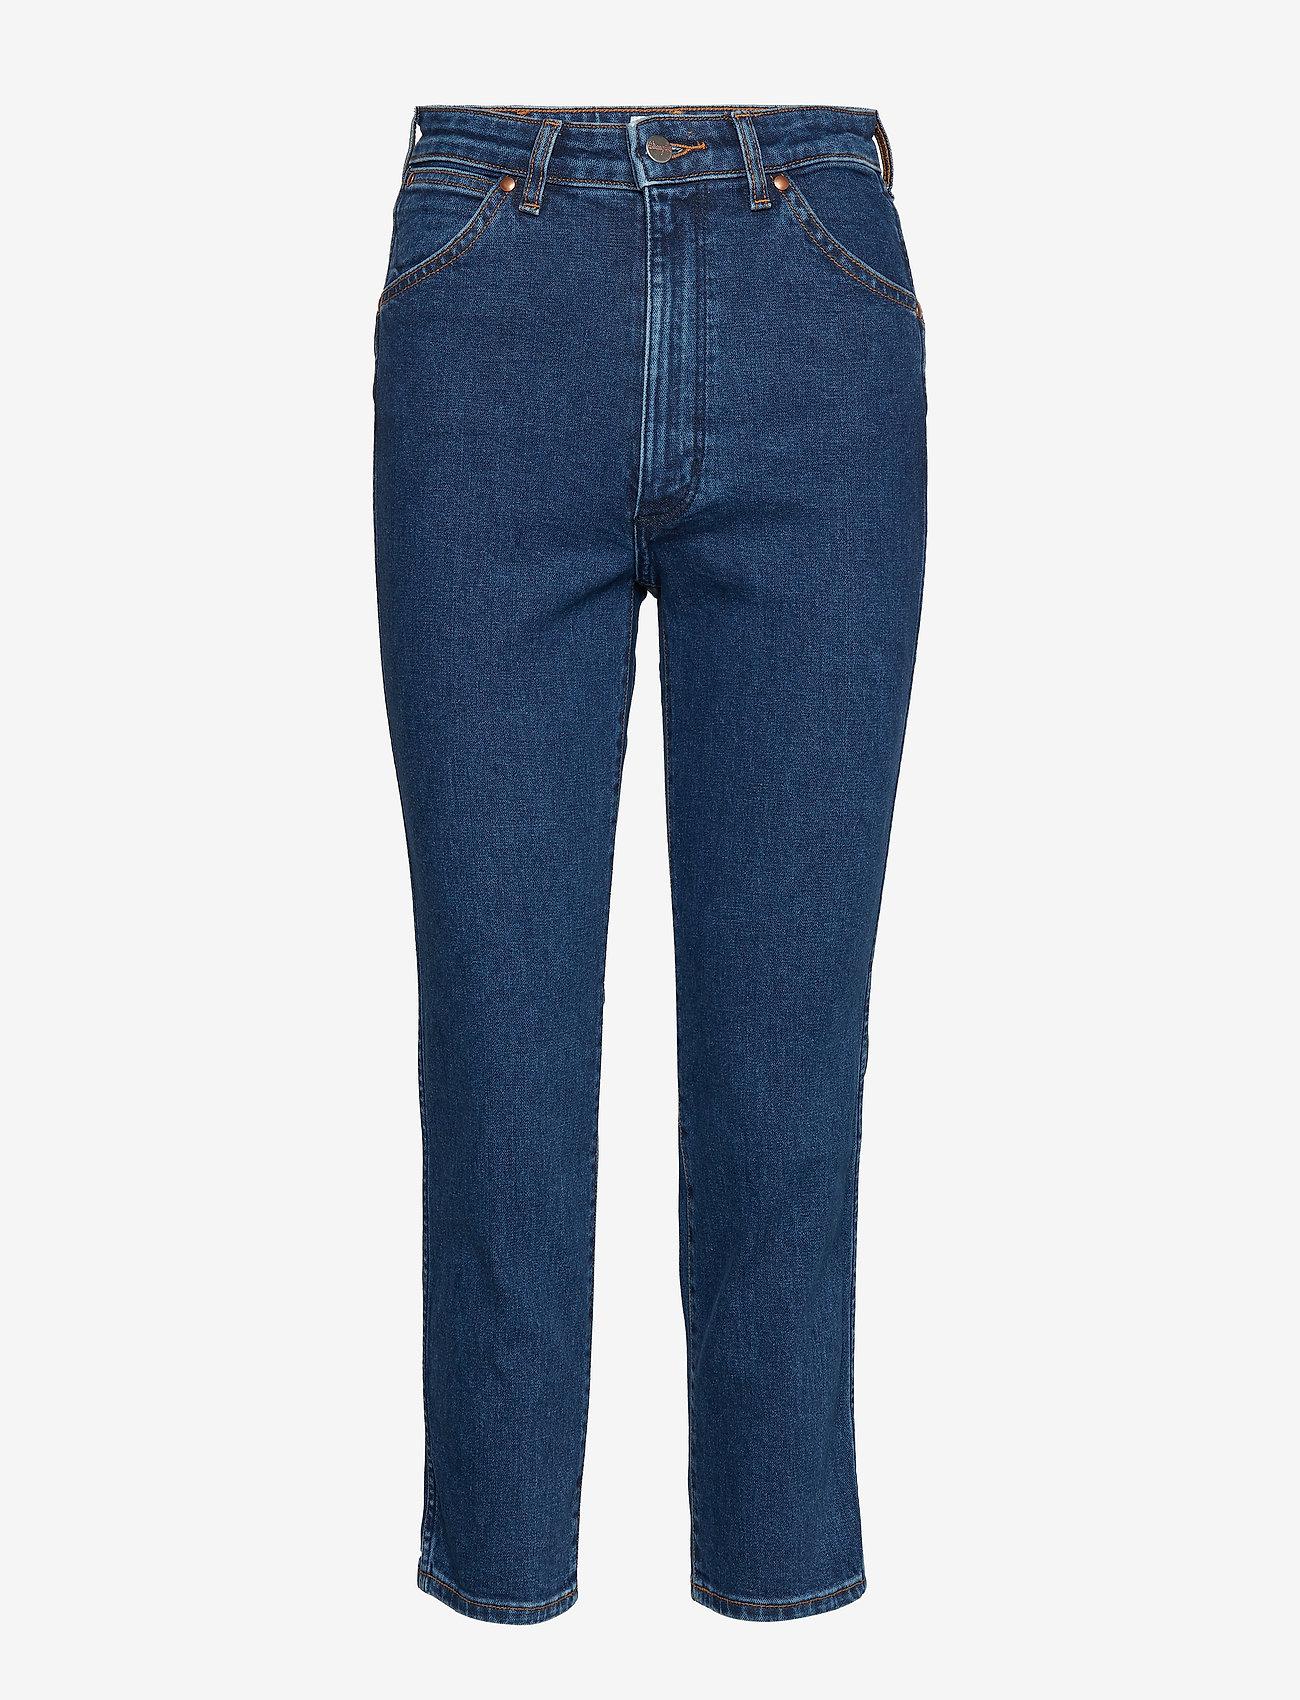 Wrangler - 11WWZ - slim jeans - 6 months - 0